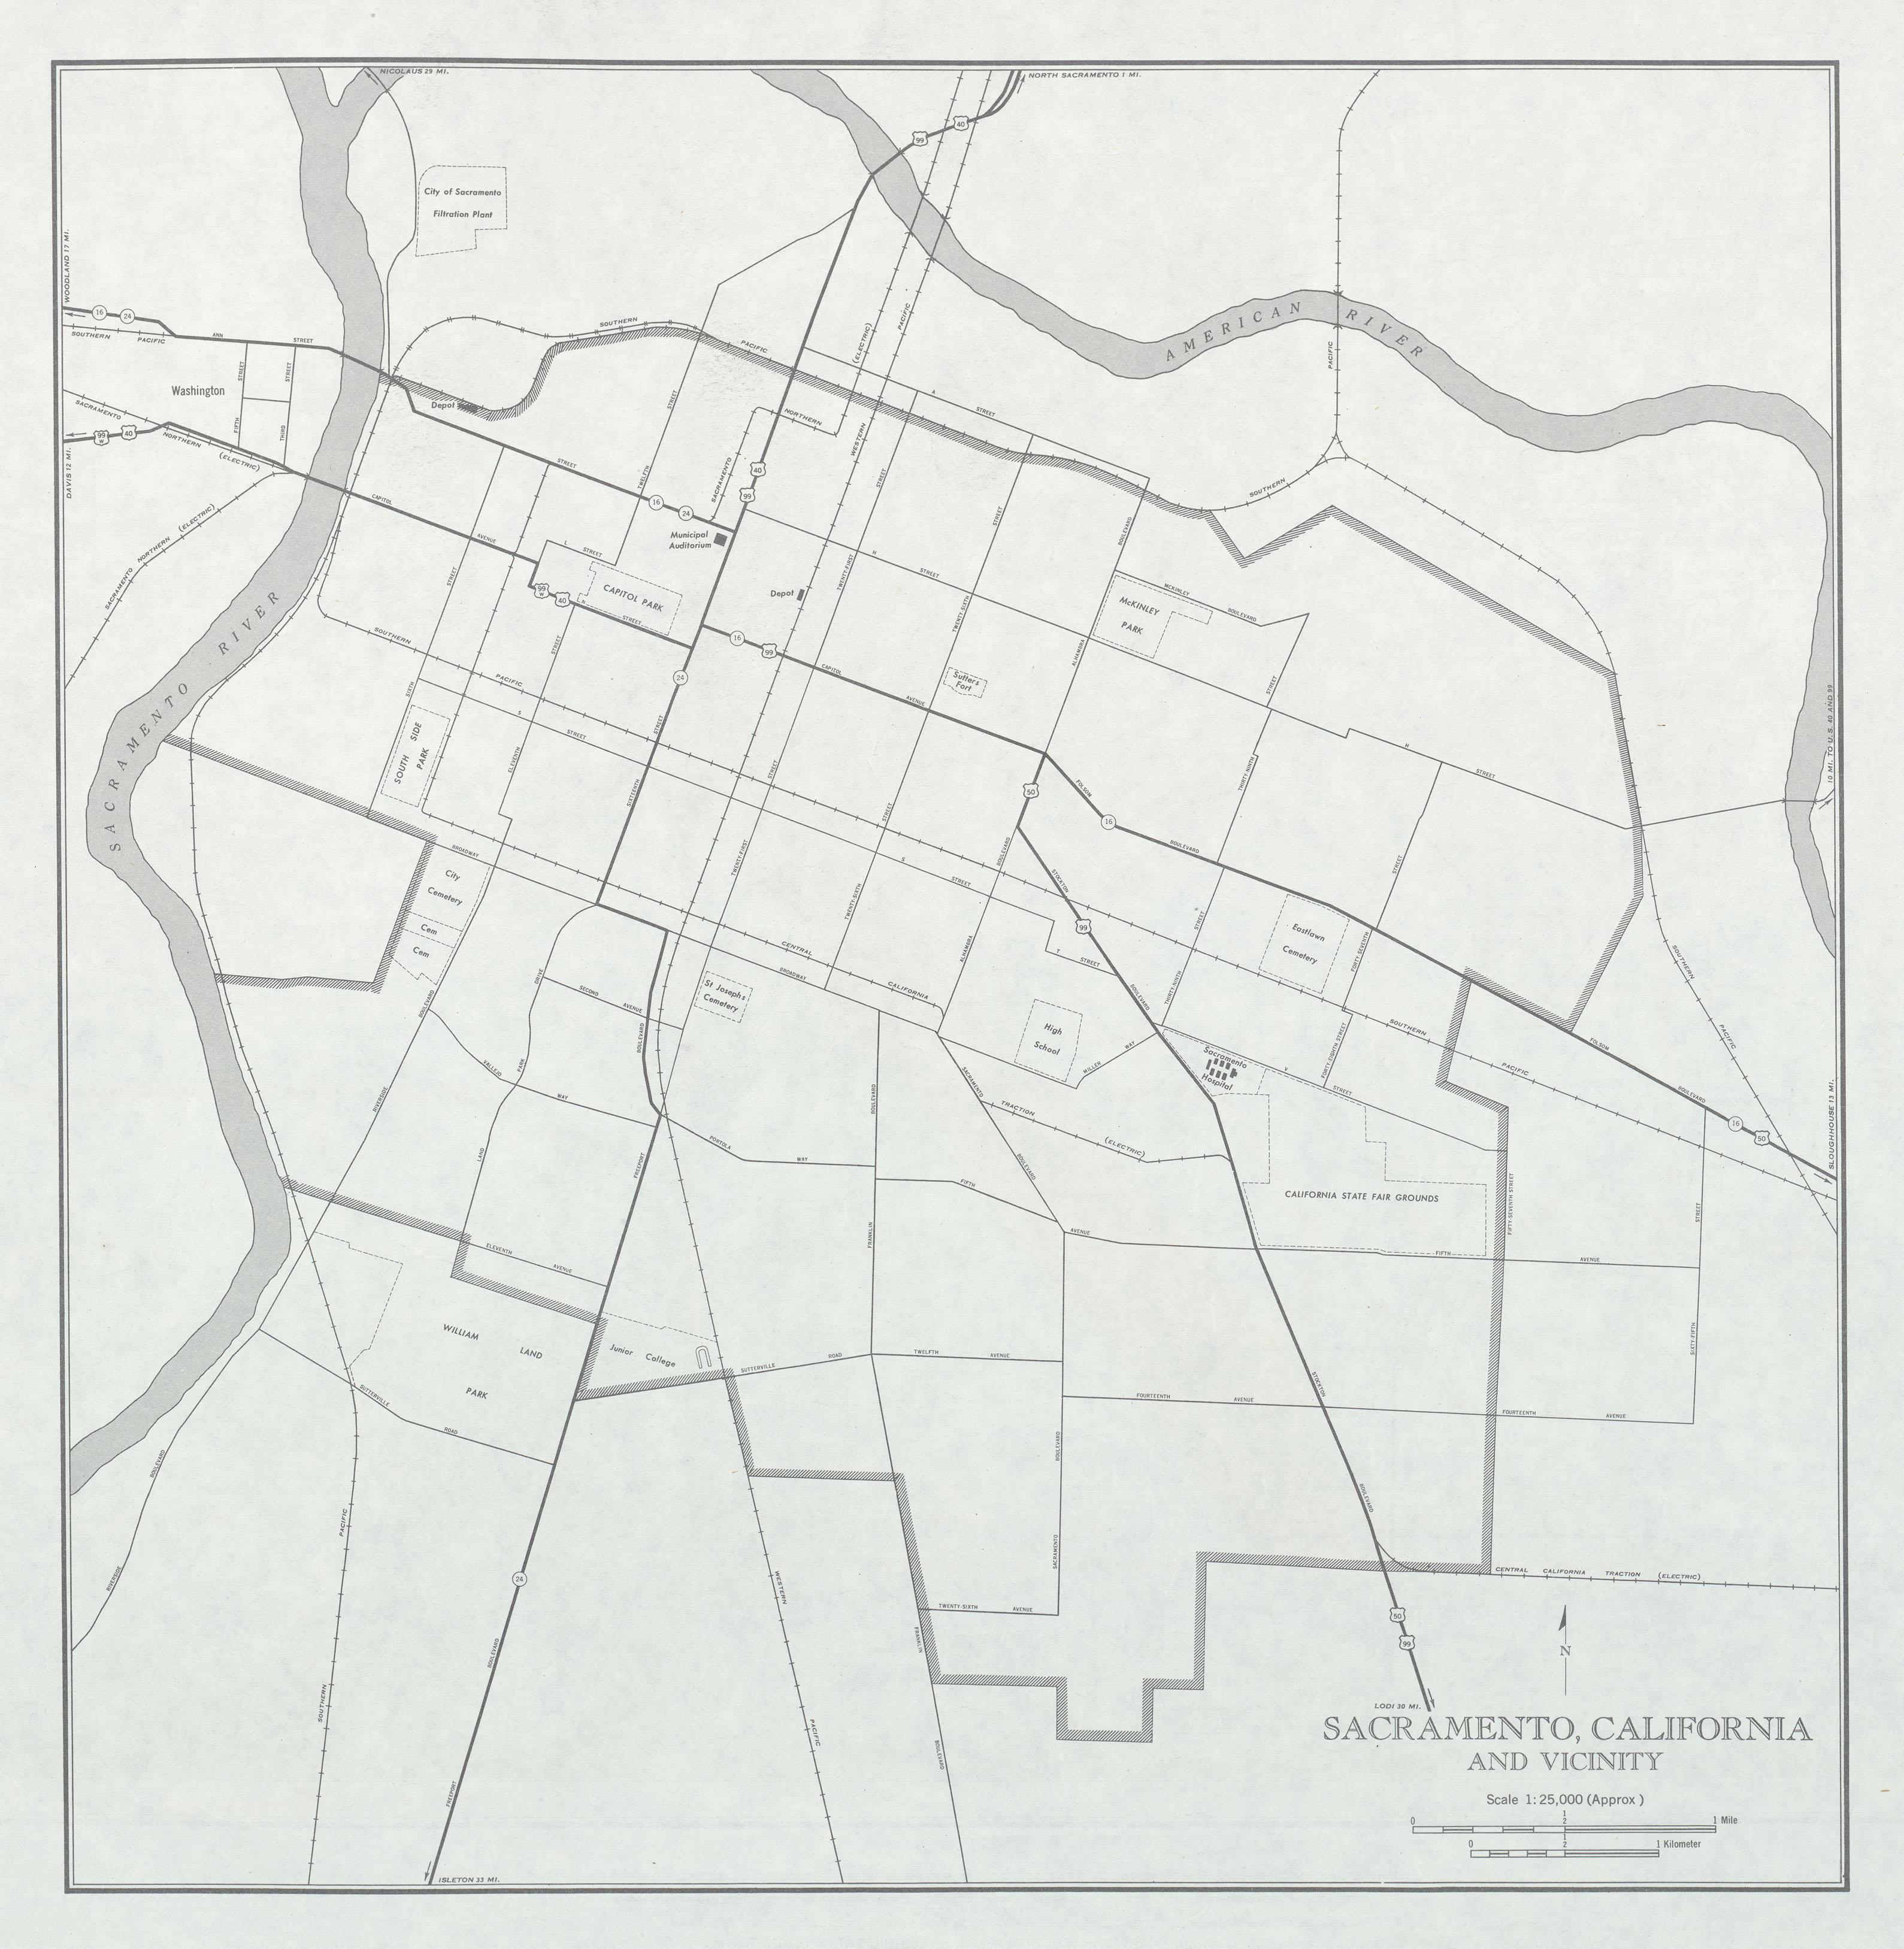 City Map of Sacramento and Vicinity, California, United States 1947